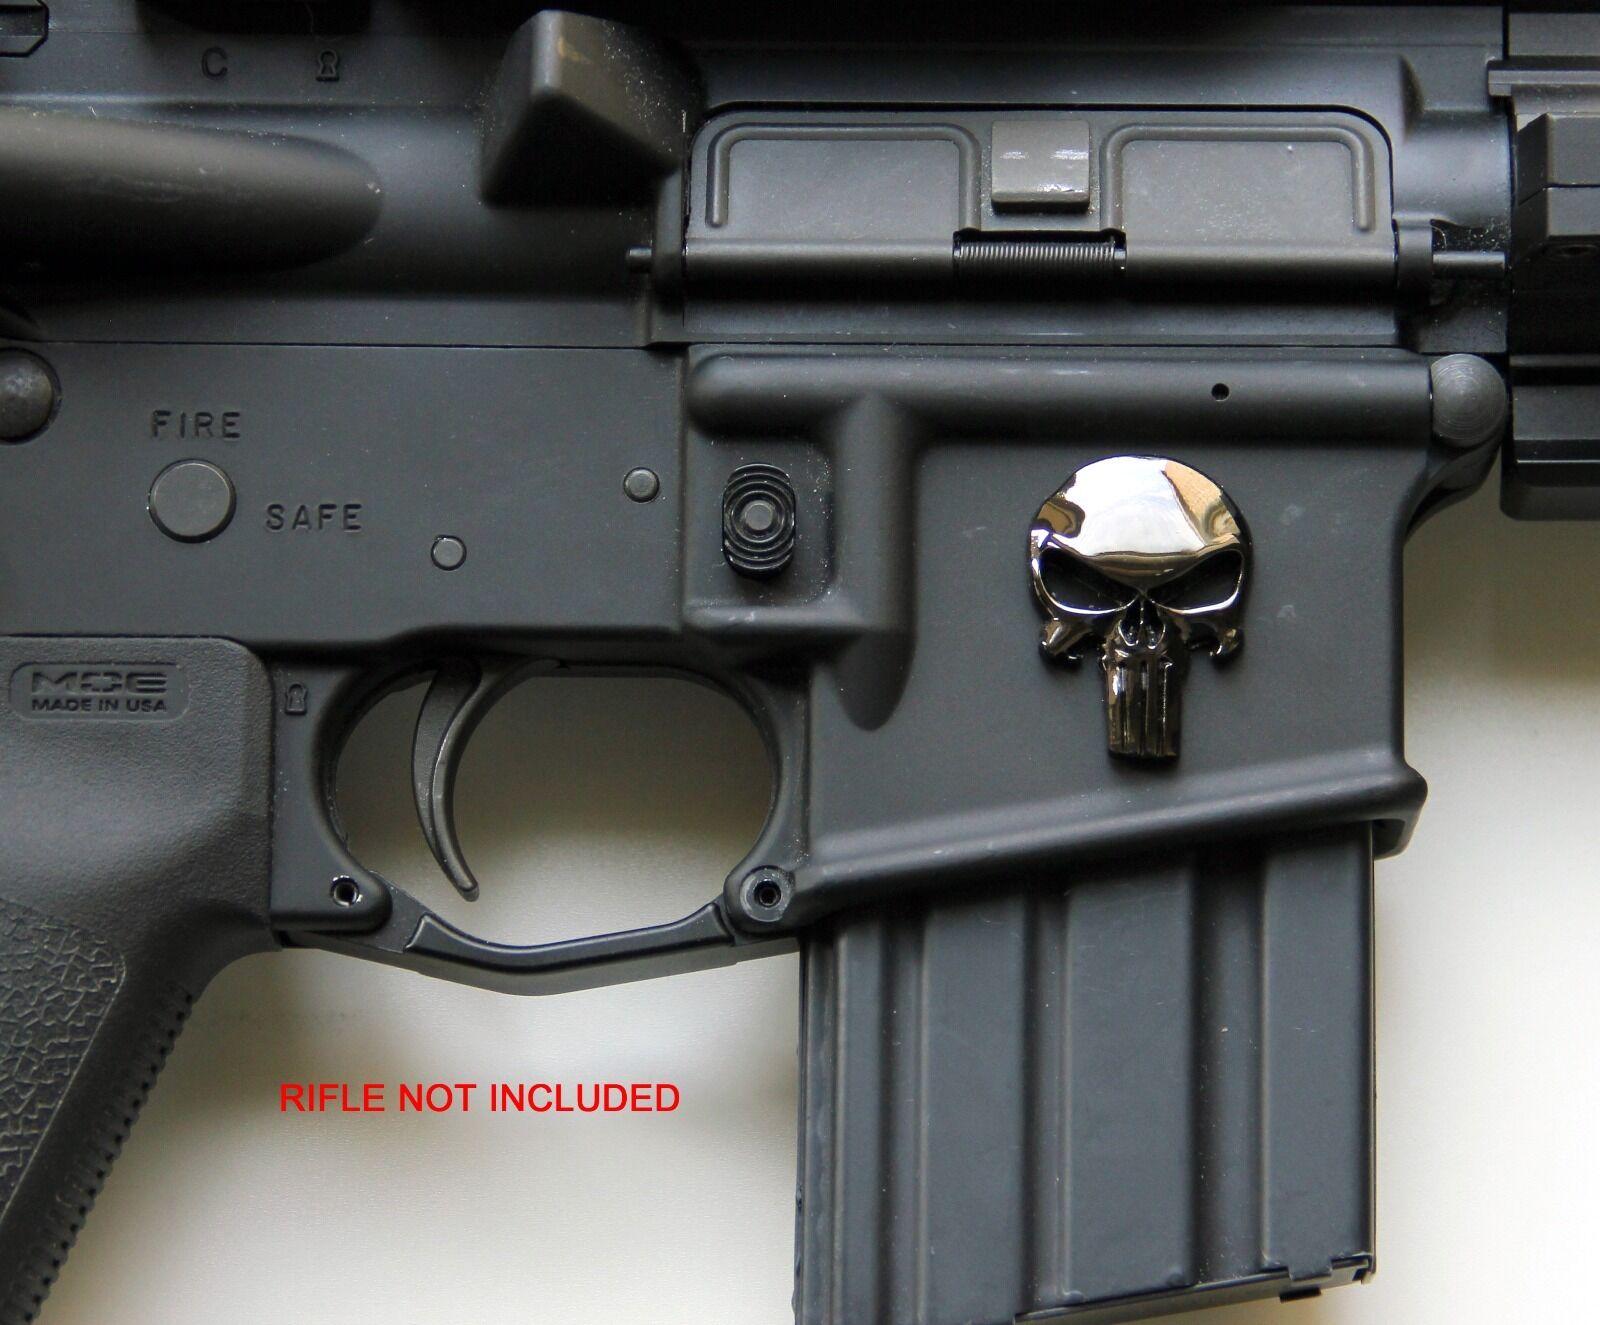 3D Skull Punisher Emblem Badge Sticker Decal for Magwell Rifle Shotgun Pistols Car Jeep BMW Camaro Mustang Silverado